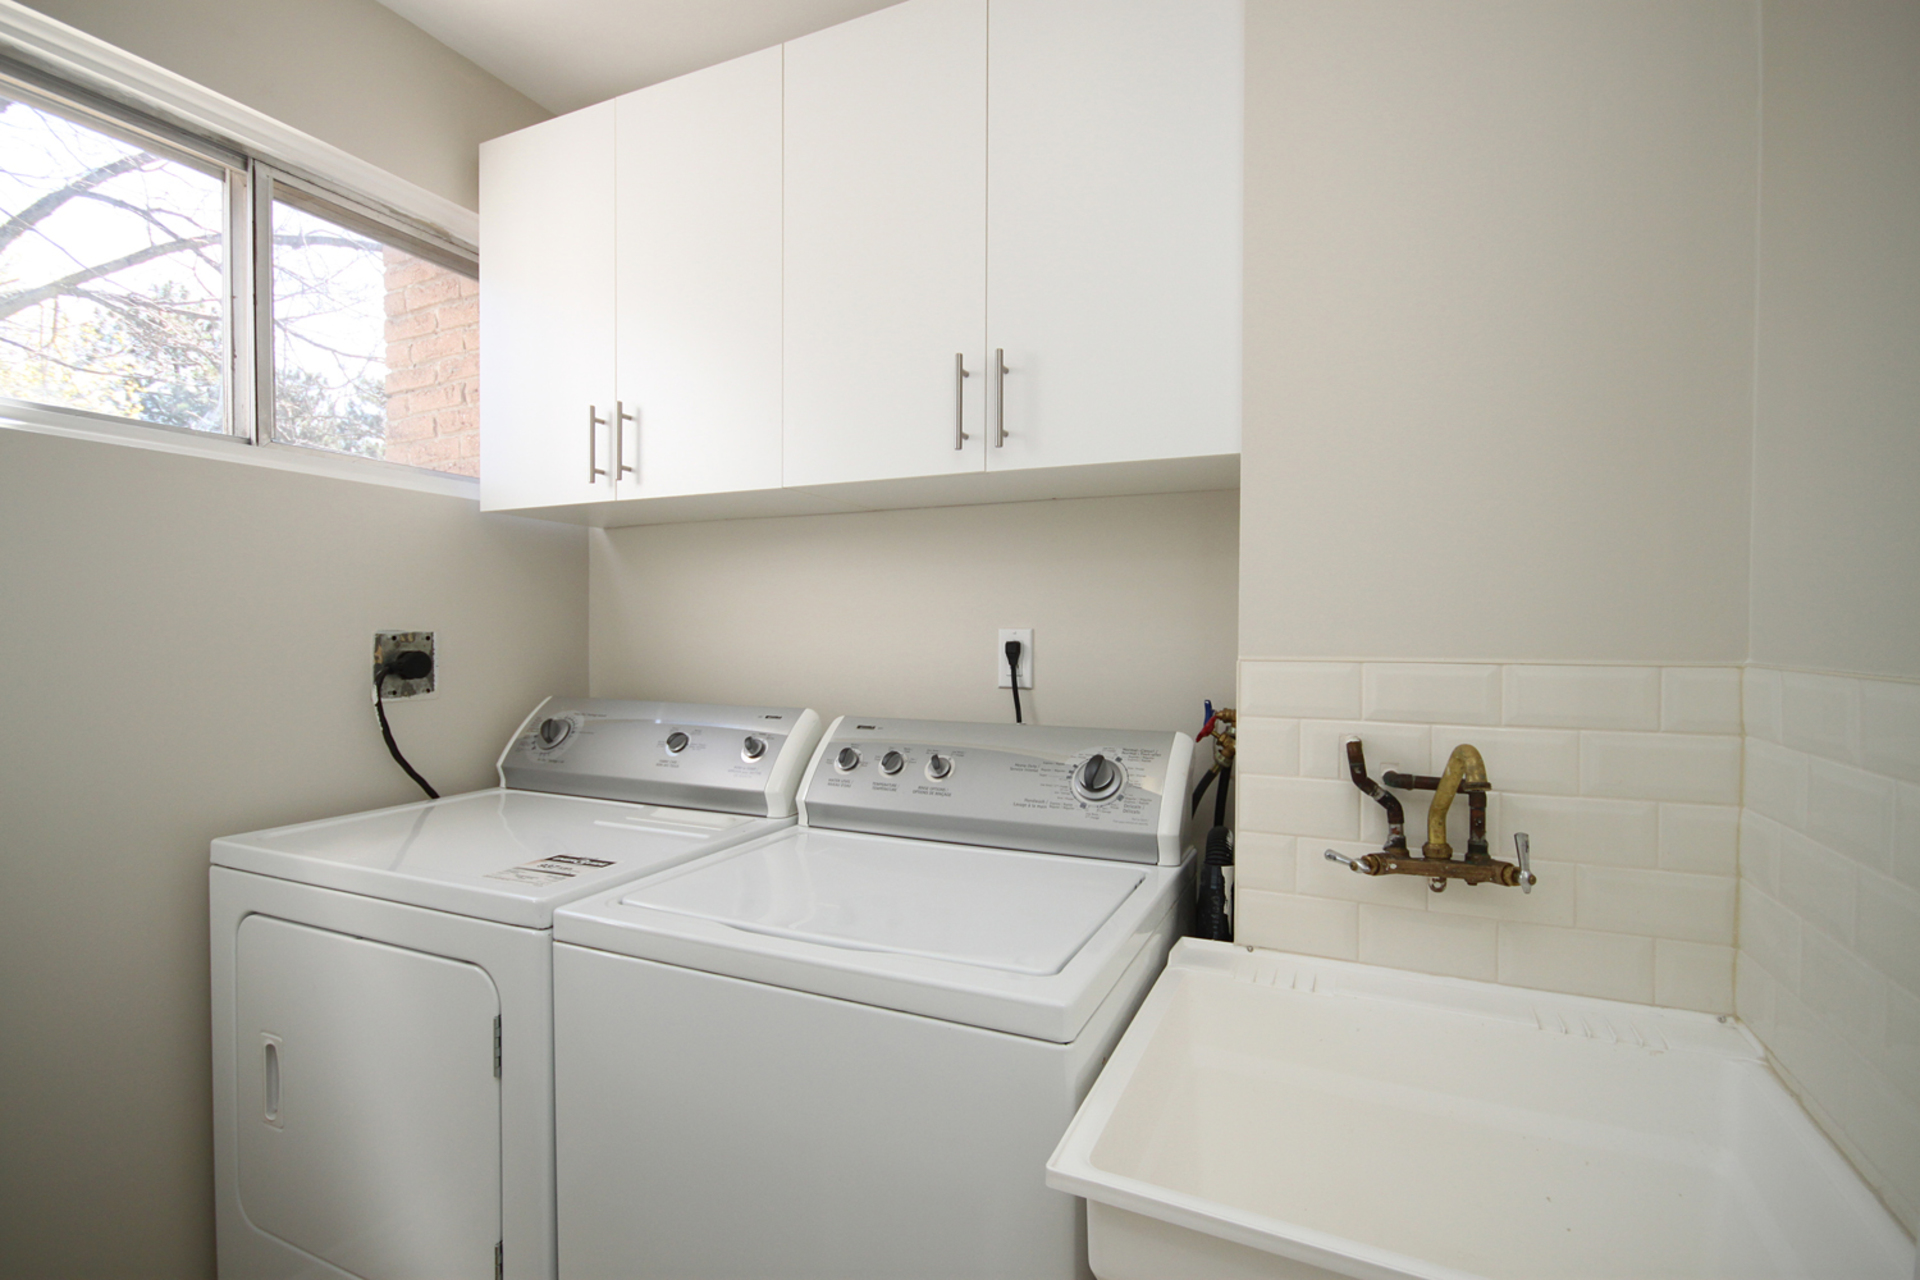 Laundry Room at 3 - 3409 St. Clair Avenue E, Clairlea-Birchmount, Toronto